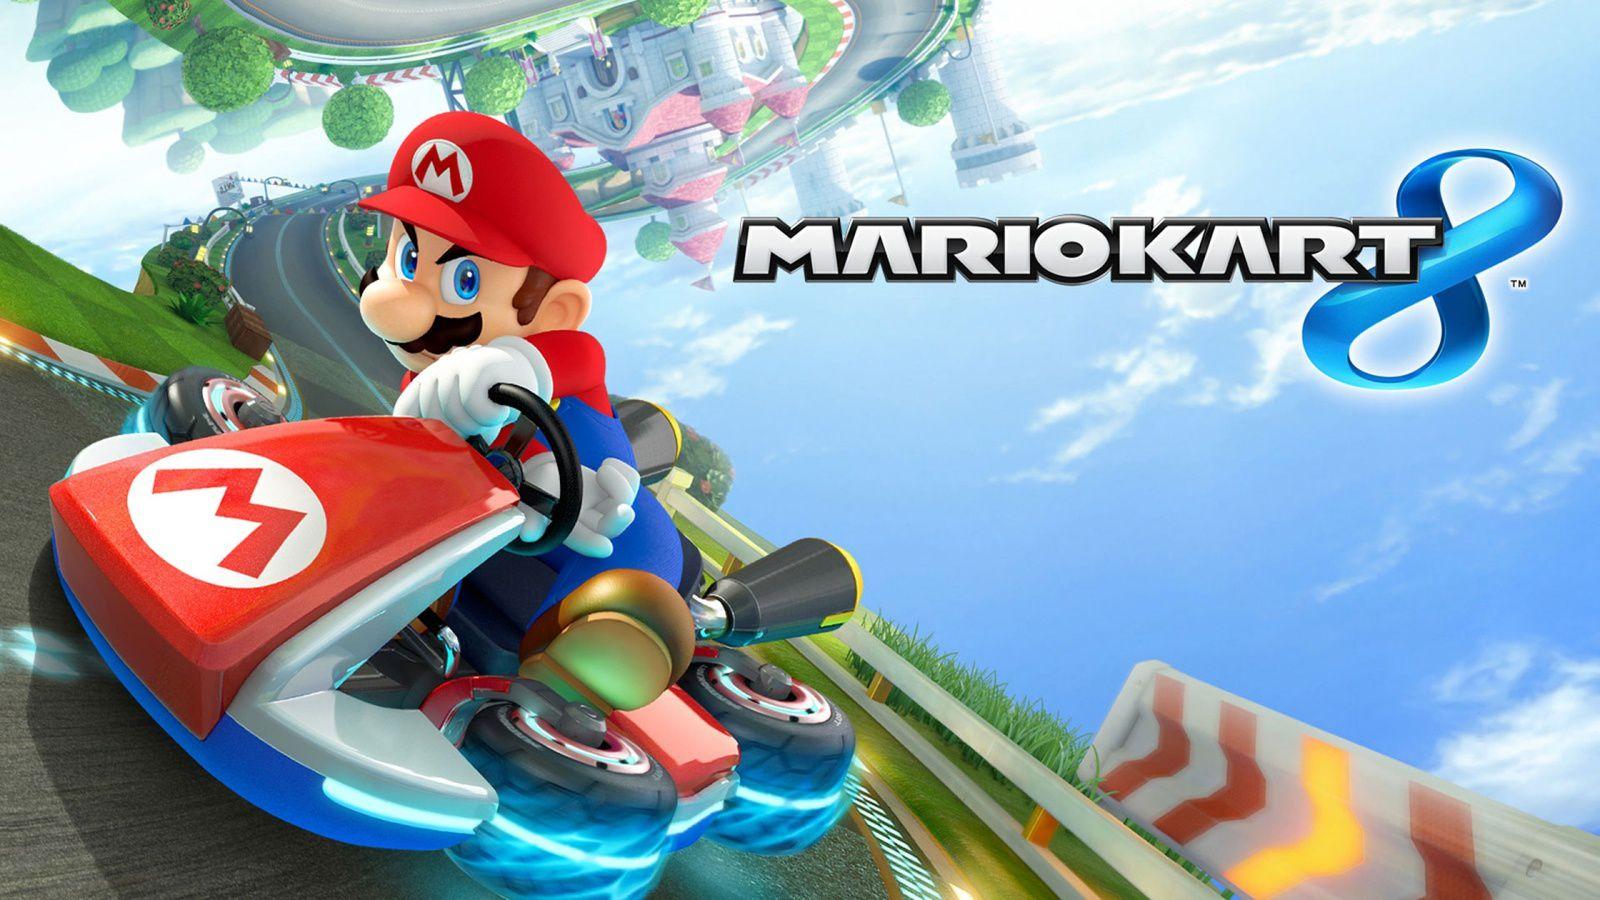 Avis Mario Kart 8 sur Wii U